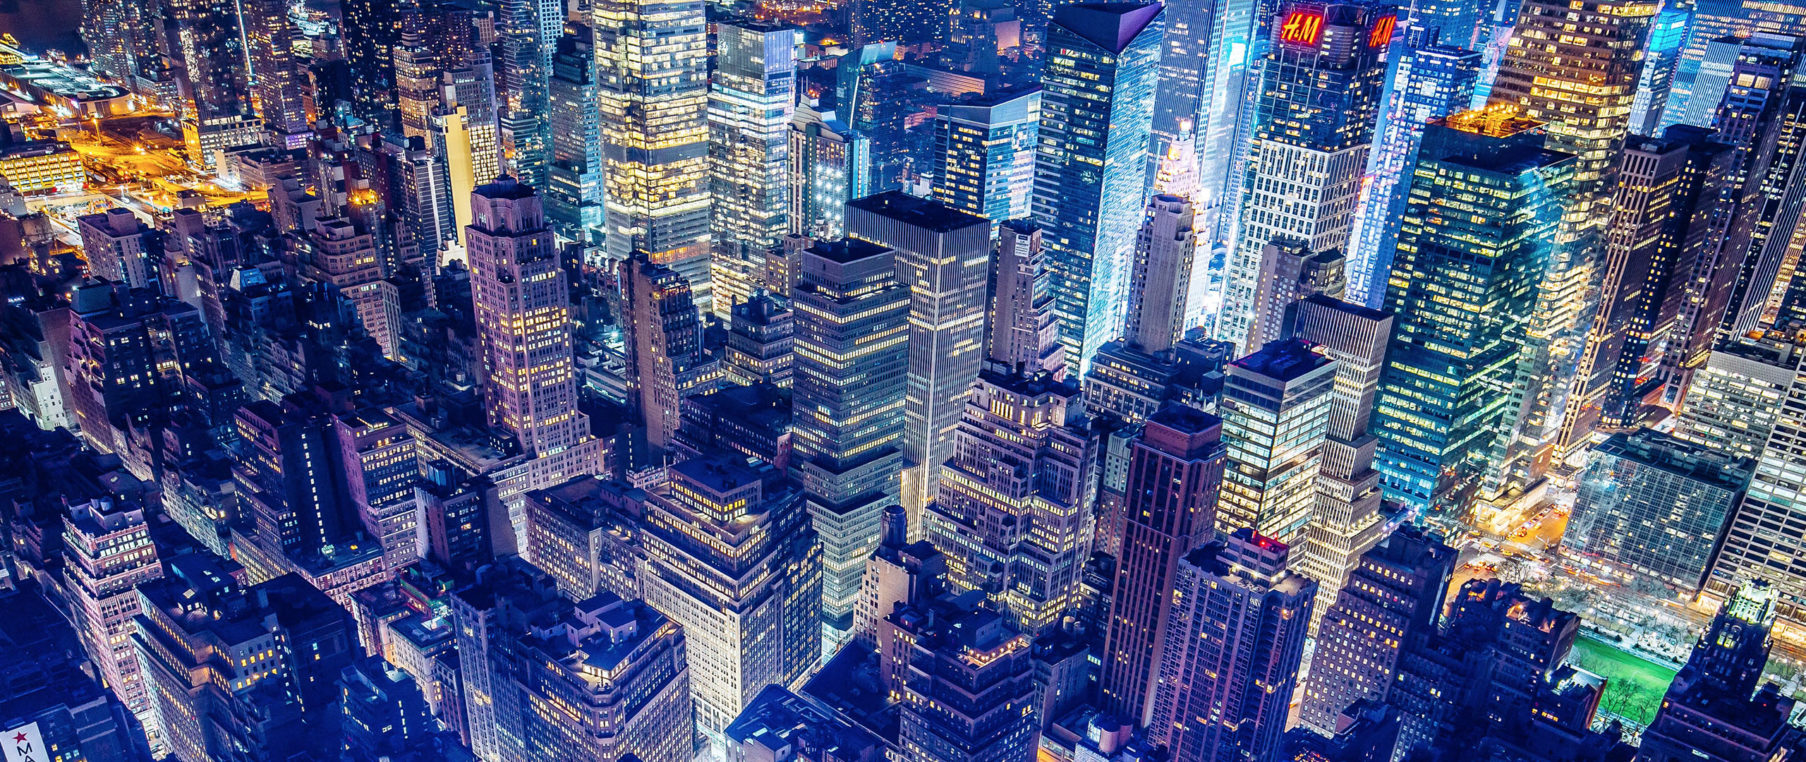 Animal Wallpaper Download City At Night 2560 215 1080 Wallpaper 2560x1080 Wallpapers